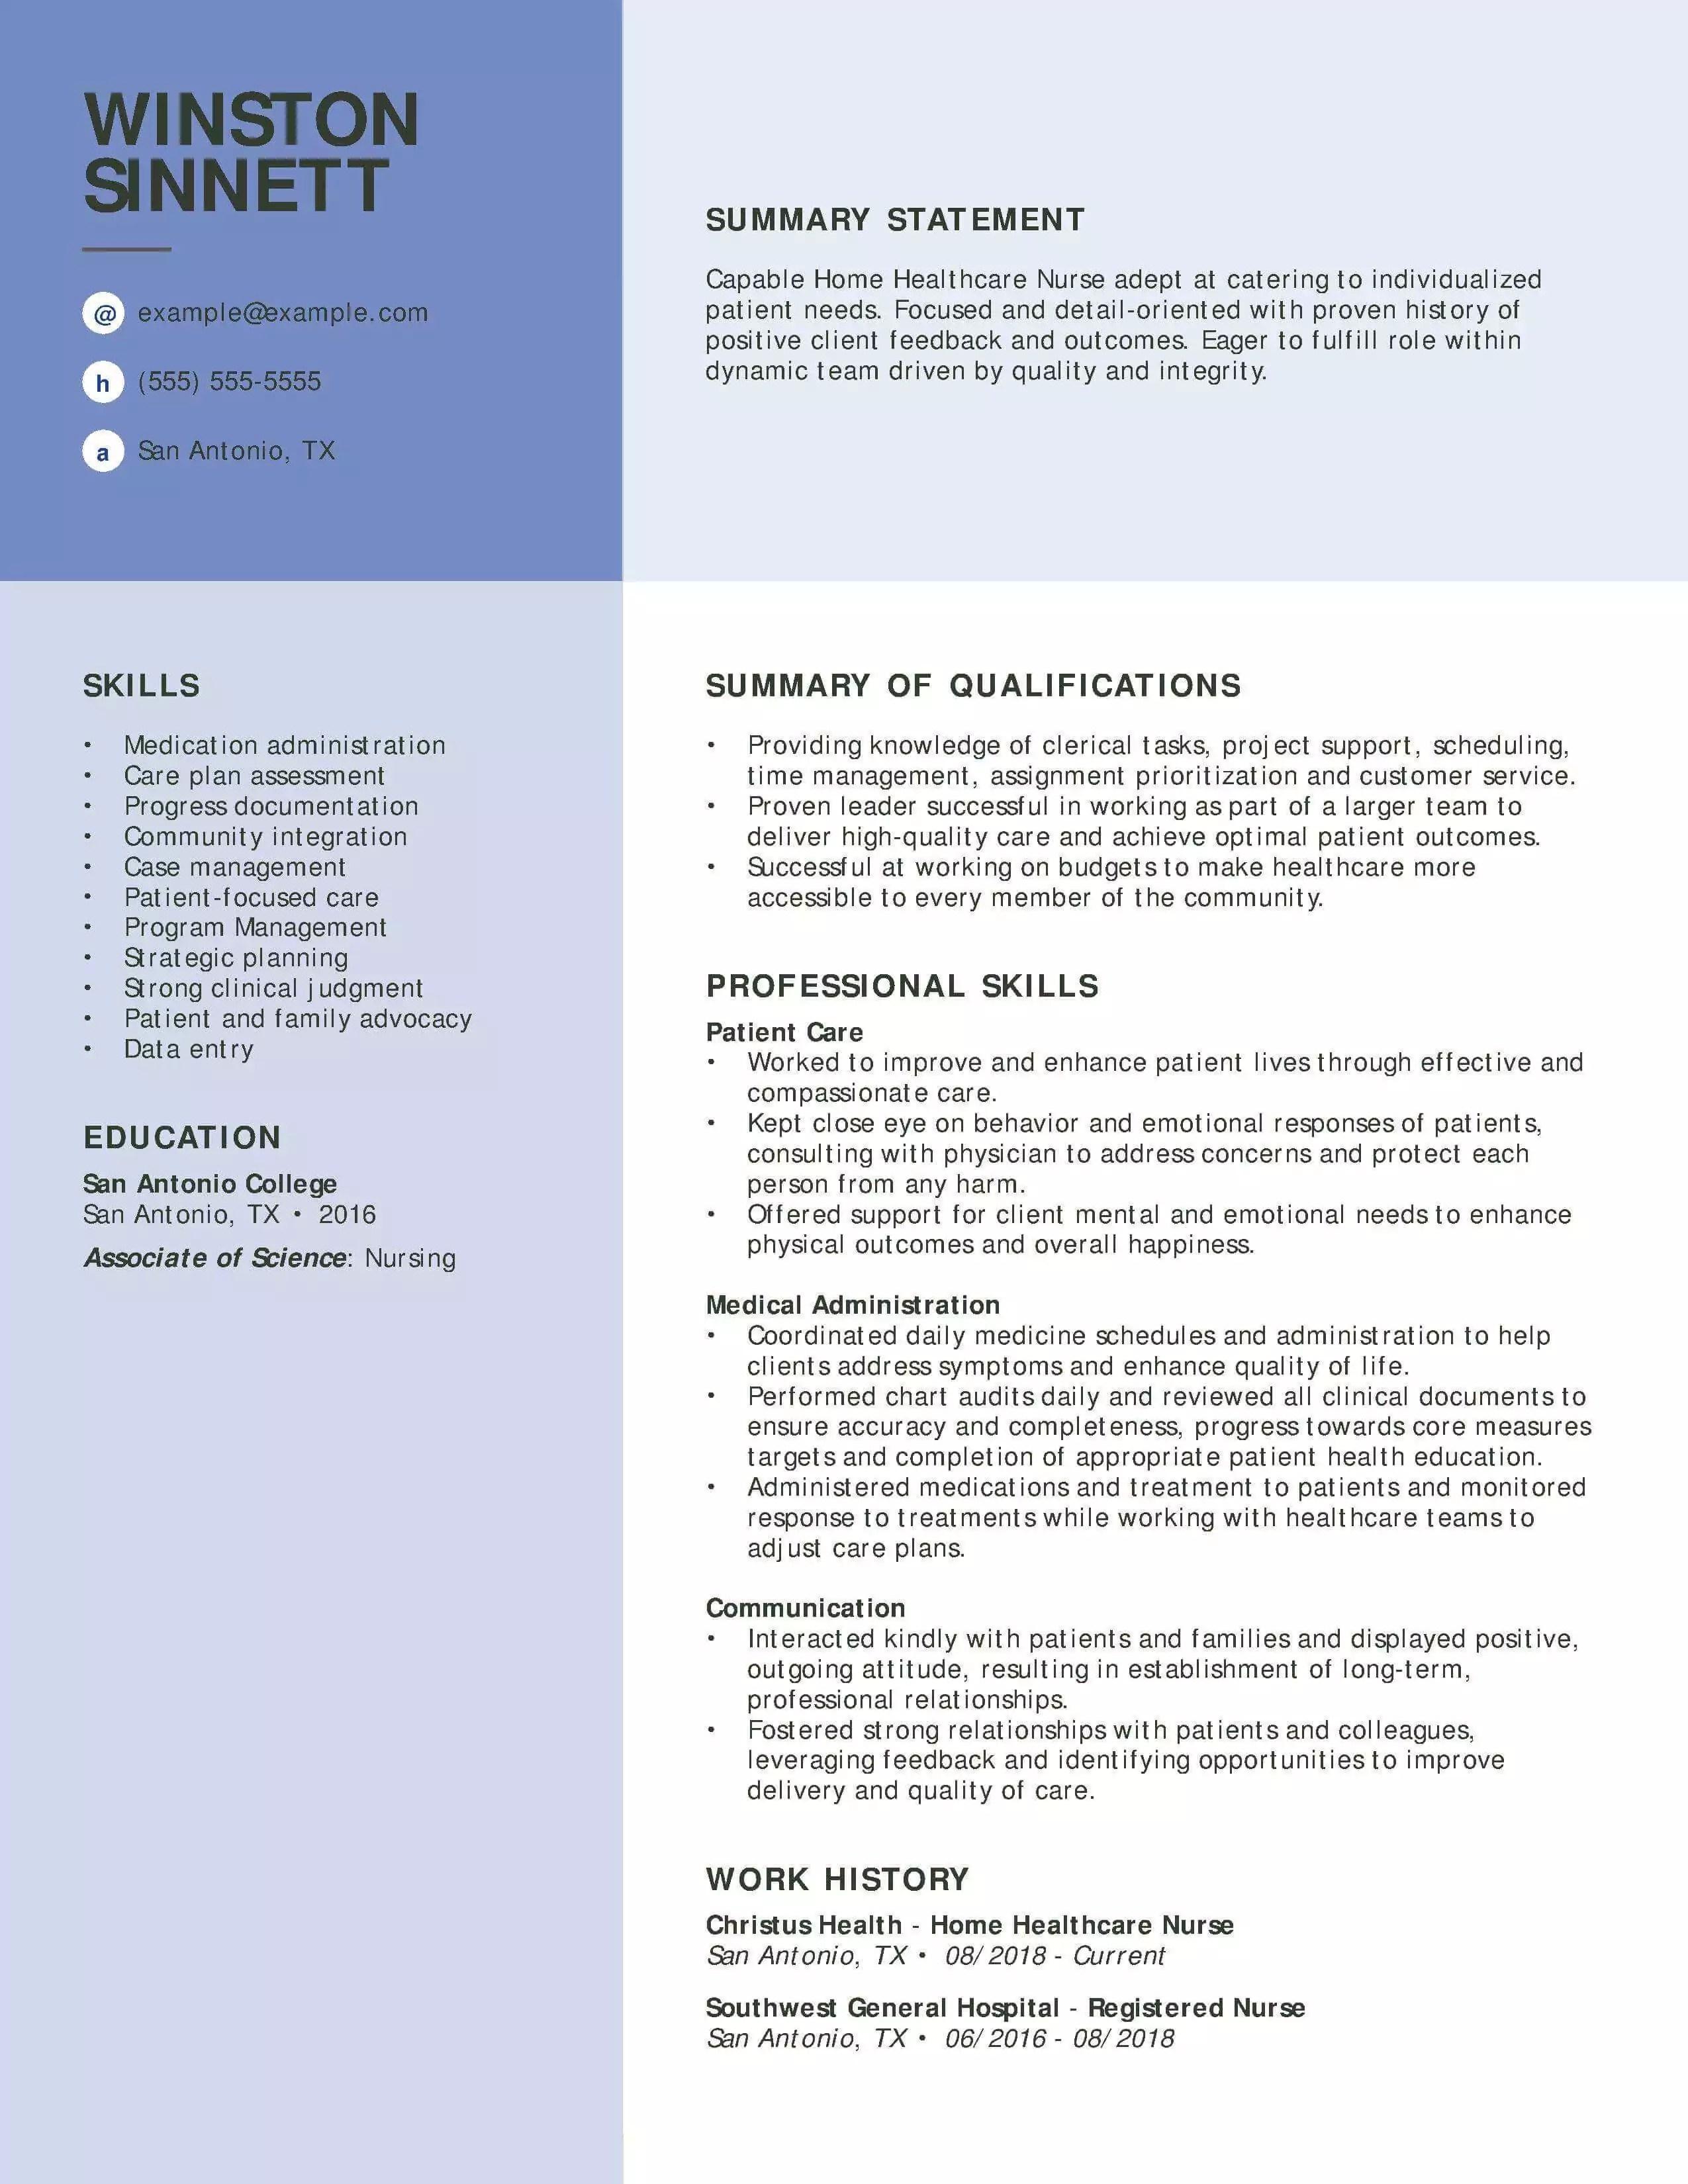 Customize Your Registered Nurse Resume With Myperfectresume